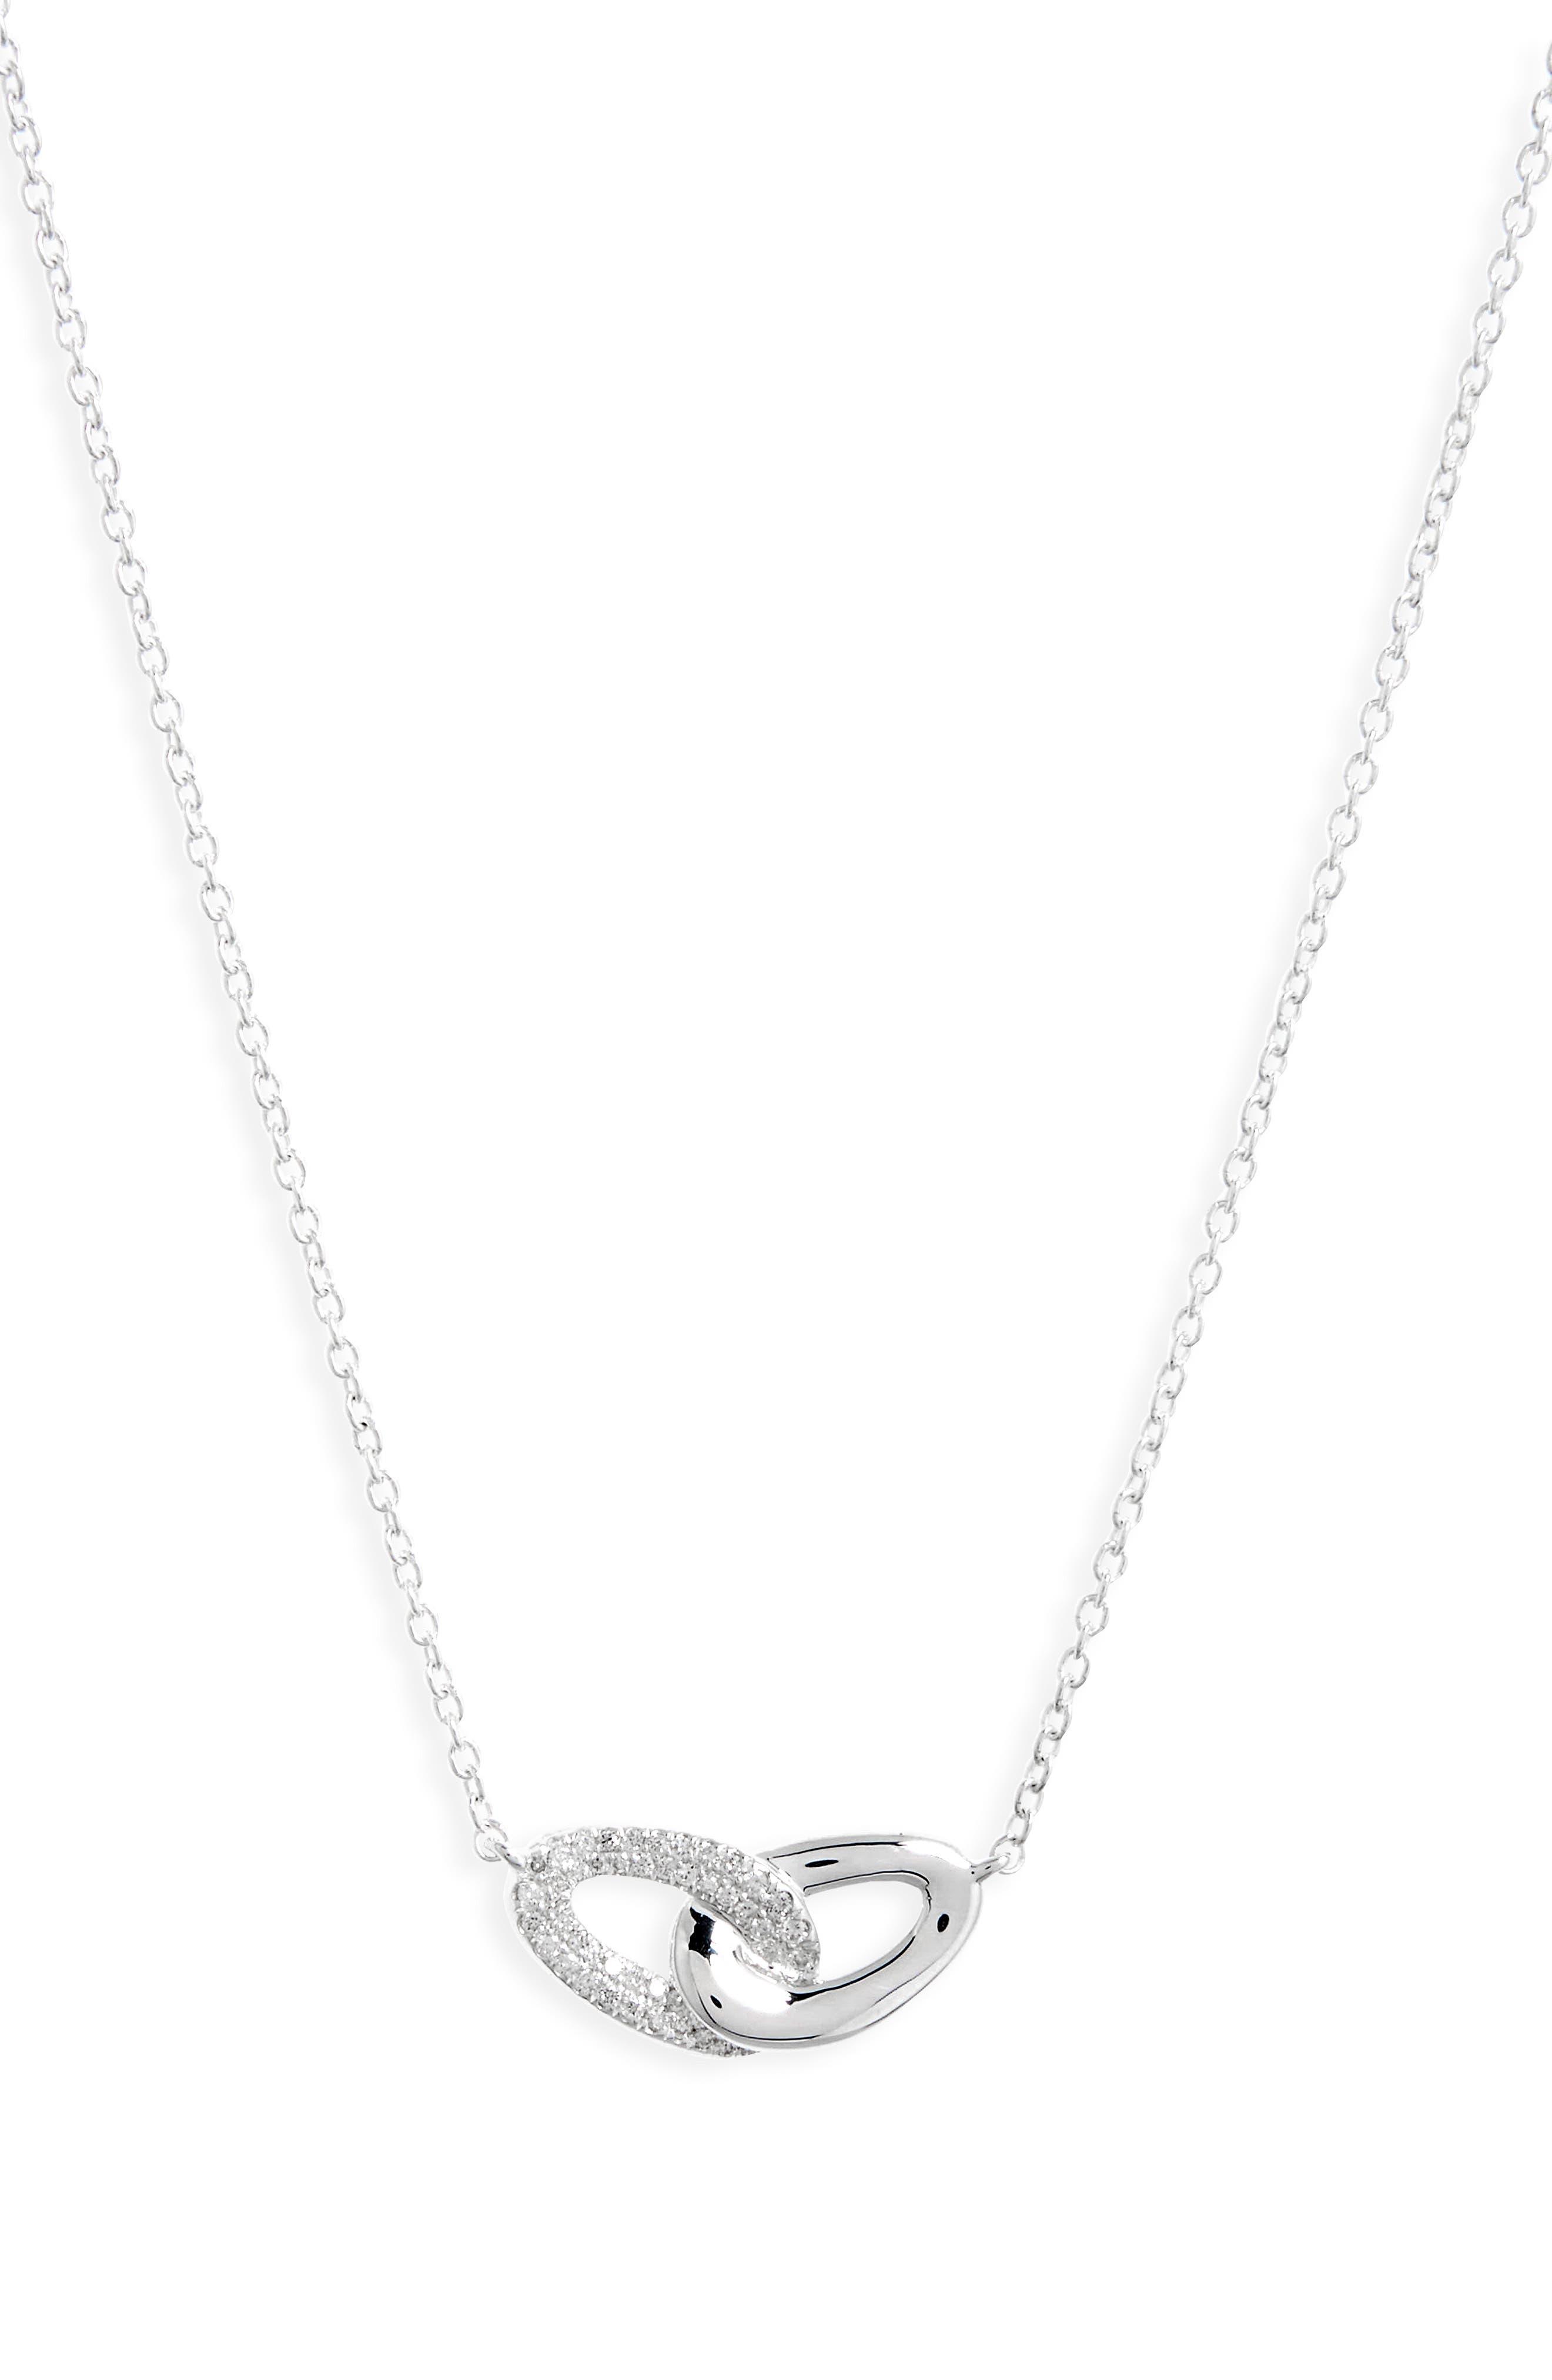 Cherish Interlocking Pendant Necklace,                             Main thumbnail 1, color,                             SILVER